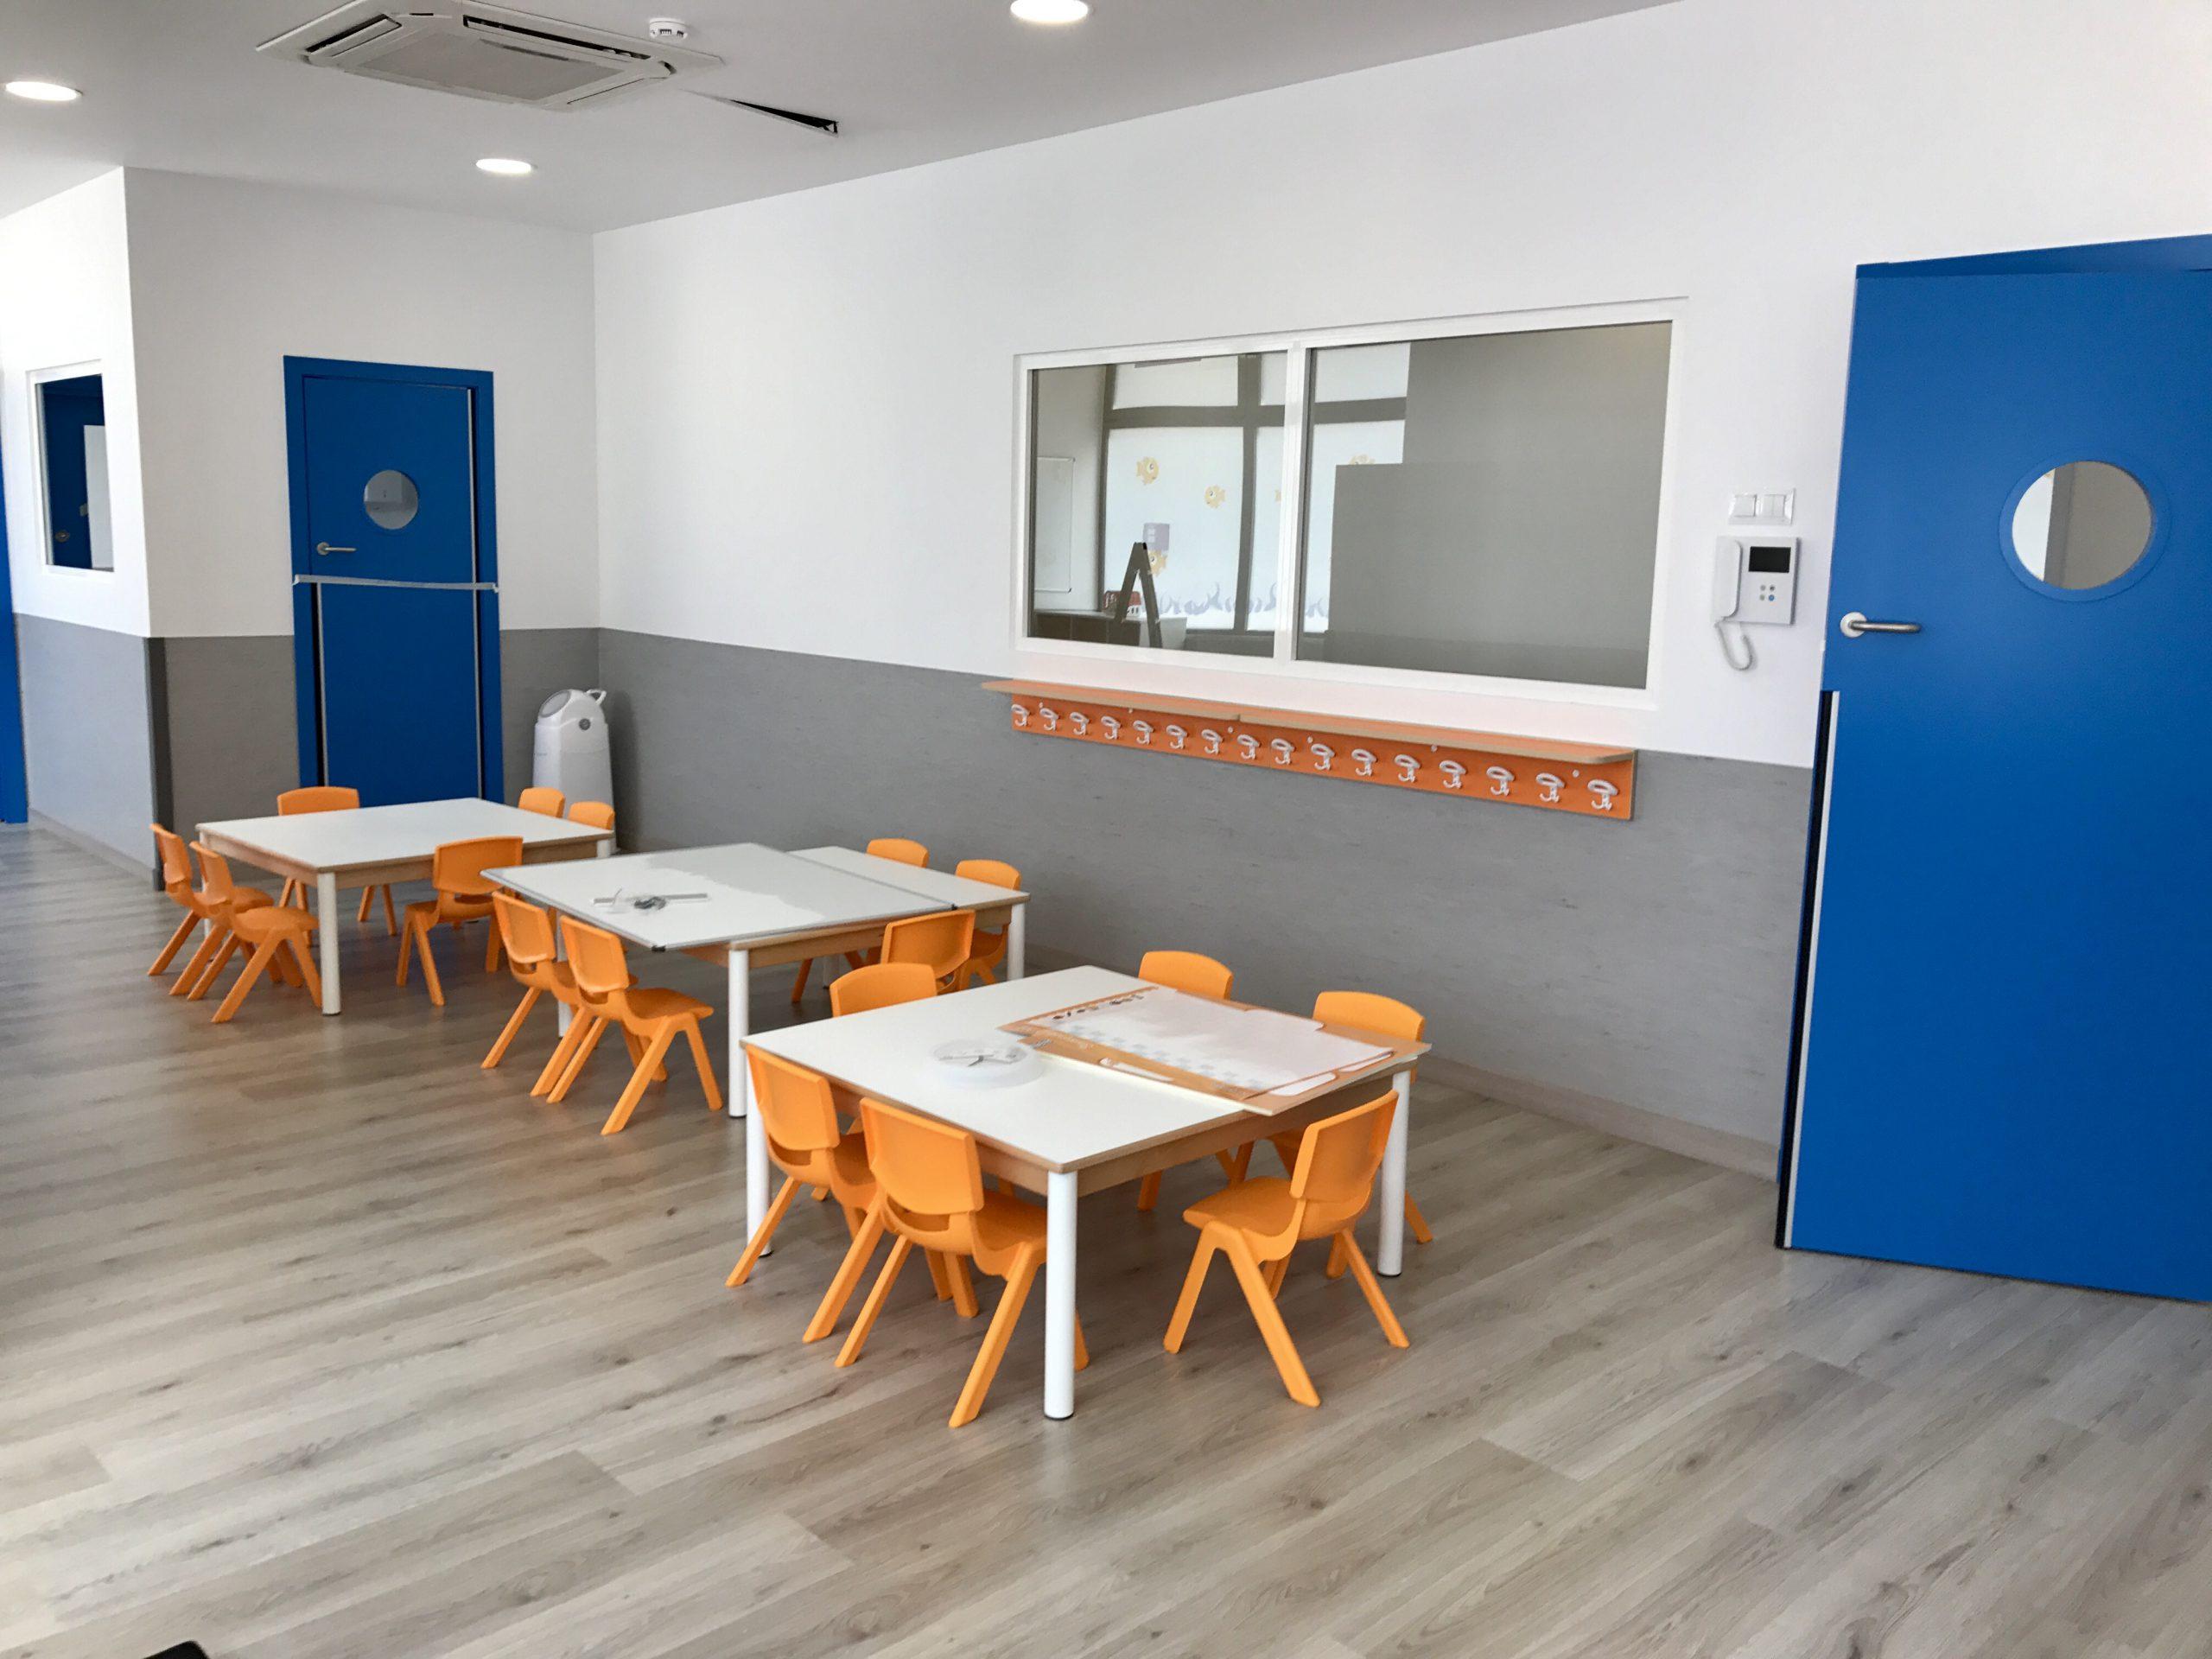 Aula 2-3 (2) Guarderia Nemomarlin Alcobendas